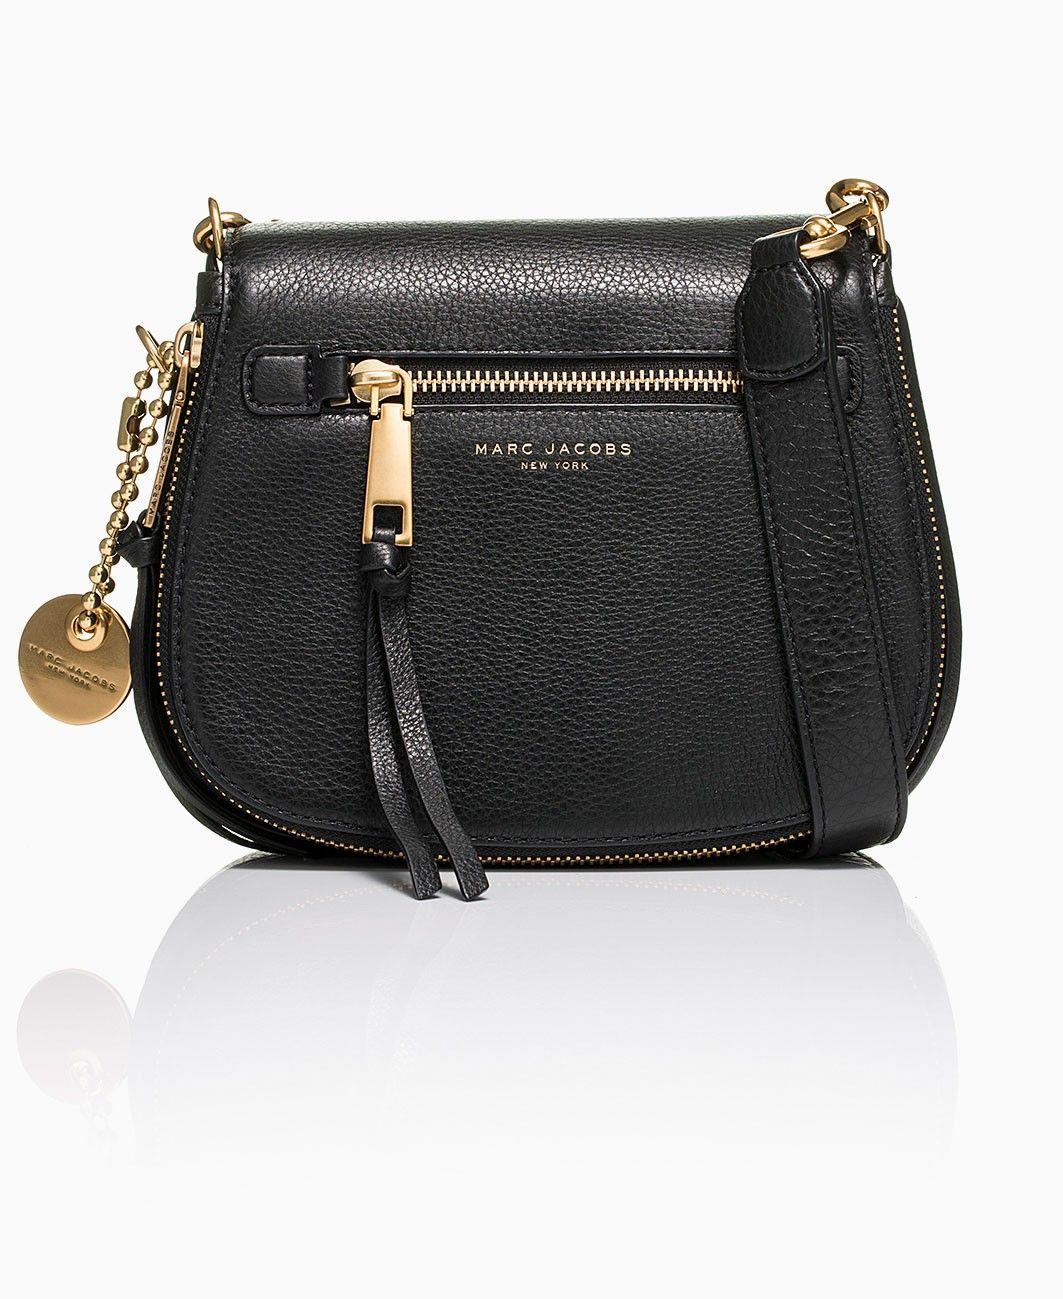 3c7b99033457 Marc Jacobs - Recruit Nomad Black Small Saddle Bag - Black - Designer  Fashion for Men   Women